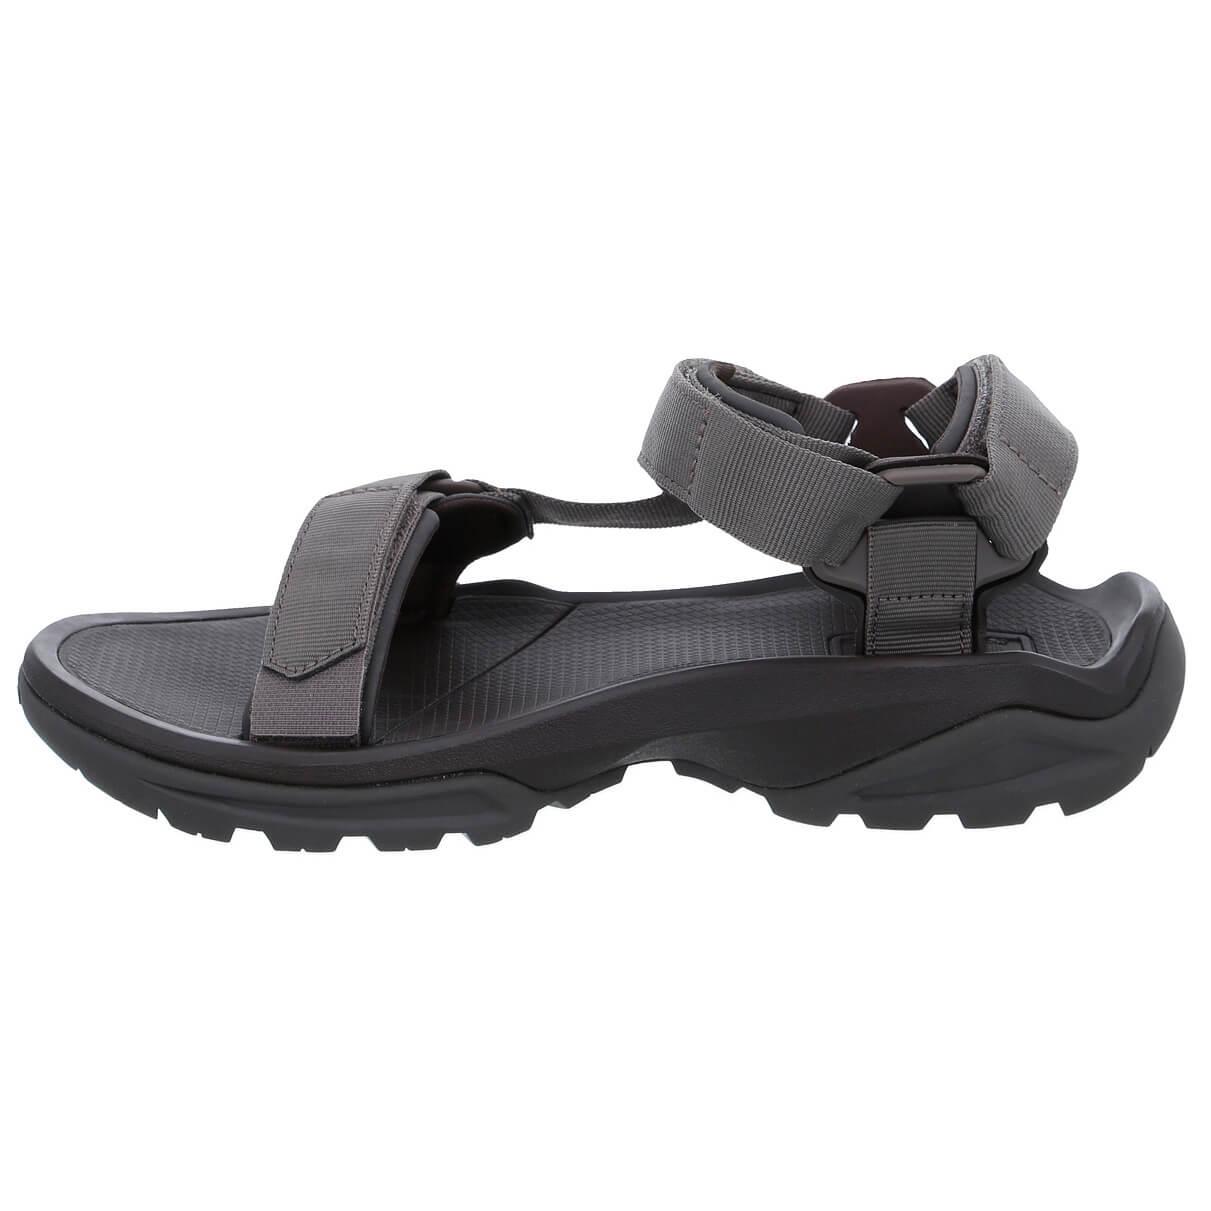 teva terra fi 4 sandals men 39 s buy online alpinetrek. Black Bedroom Furniture Sets. Home Design Ideas